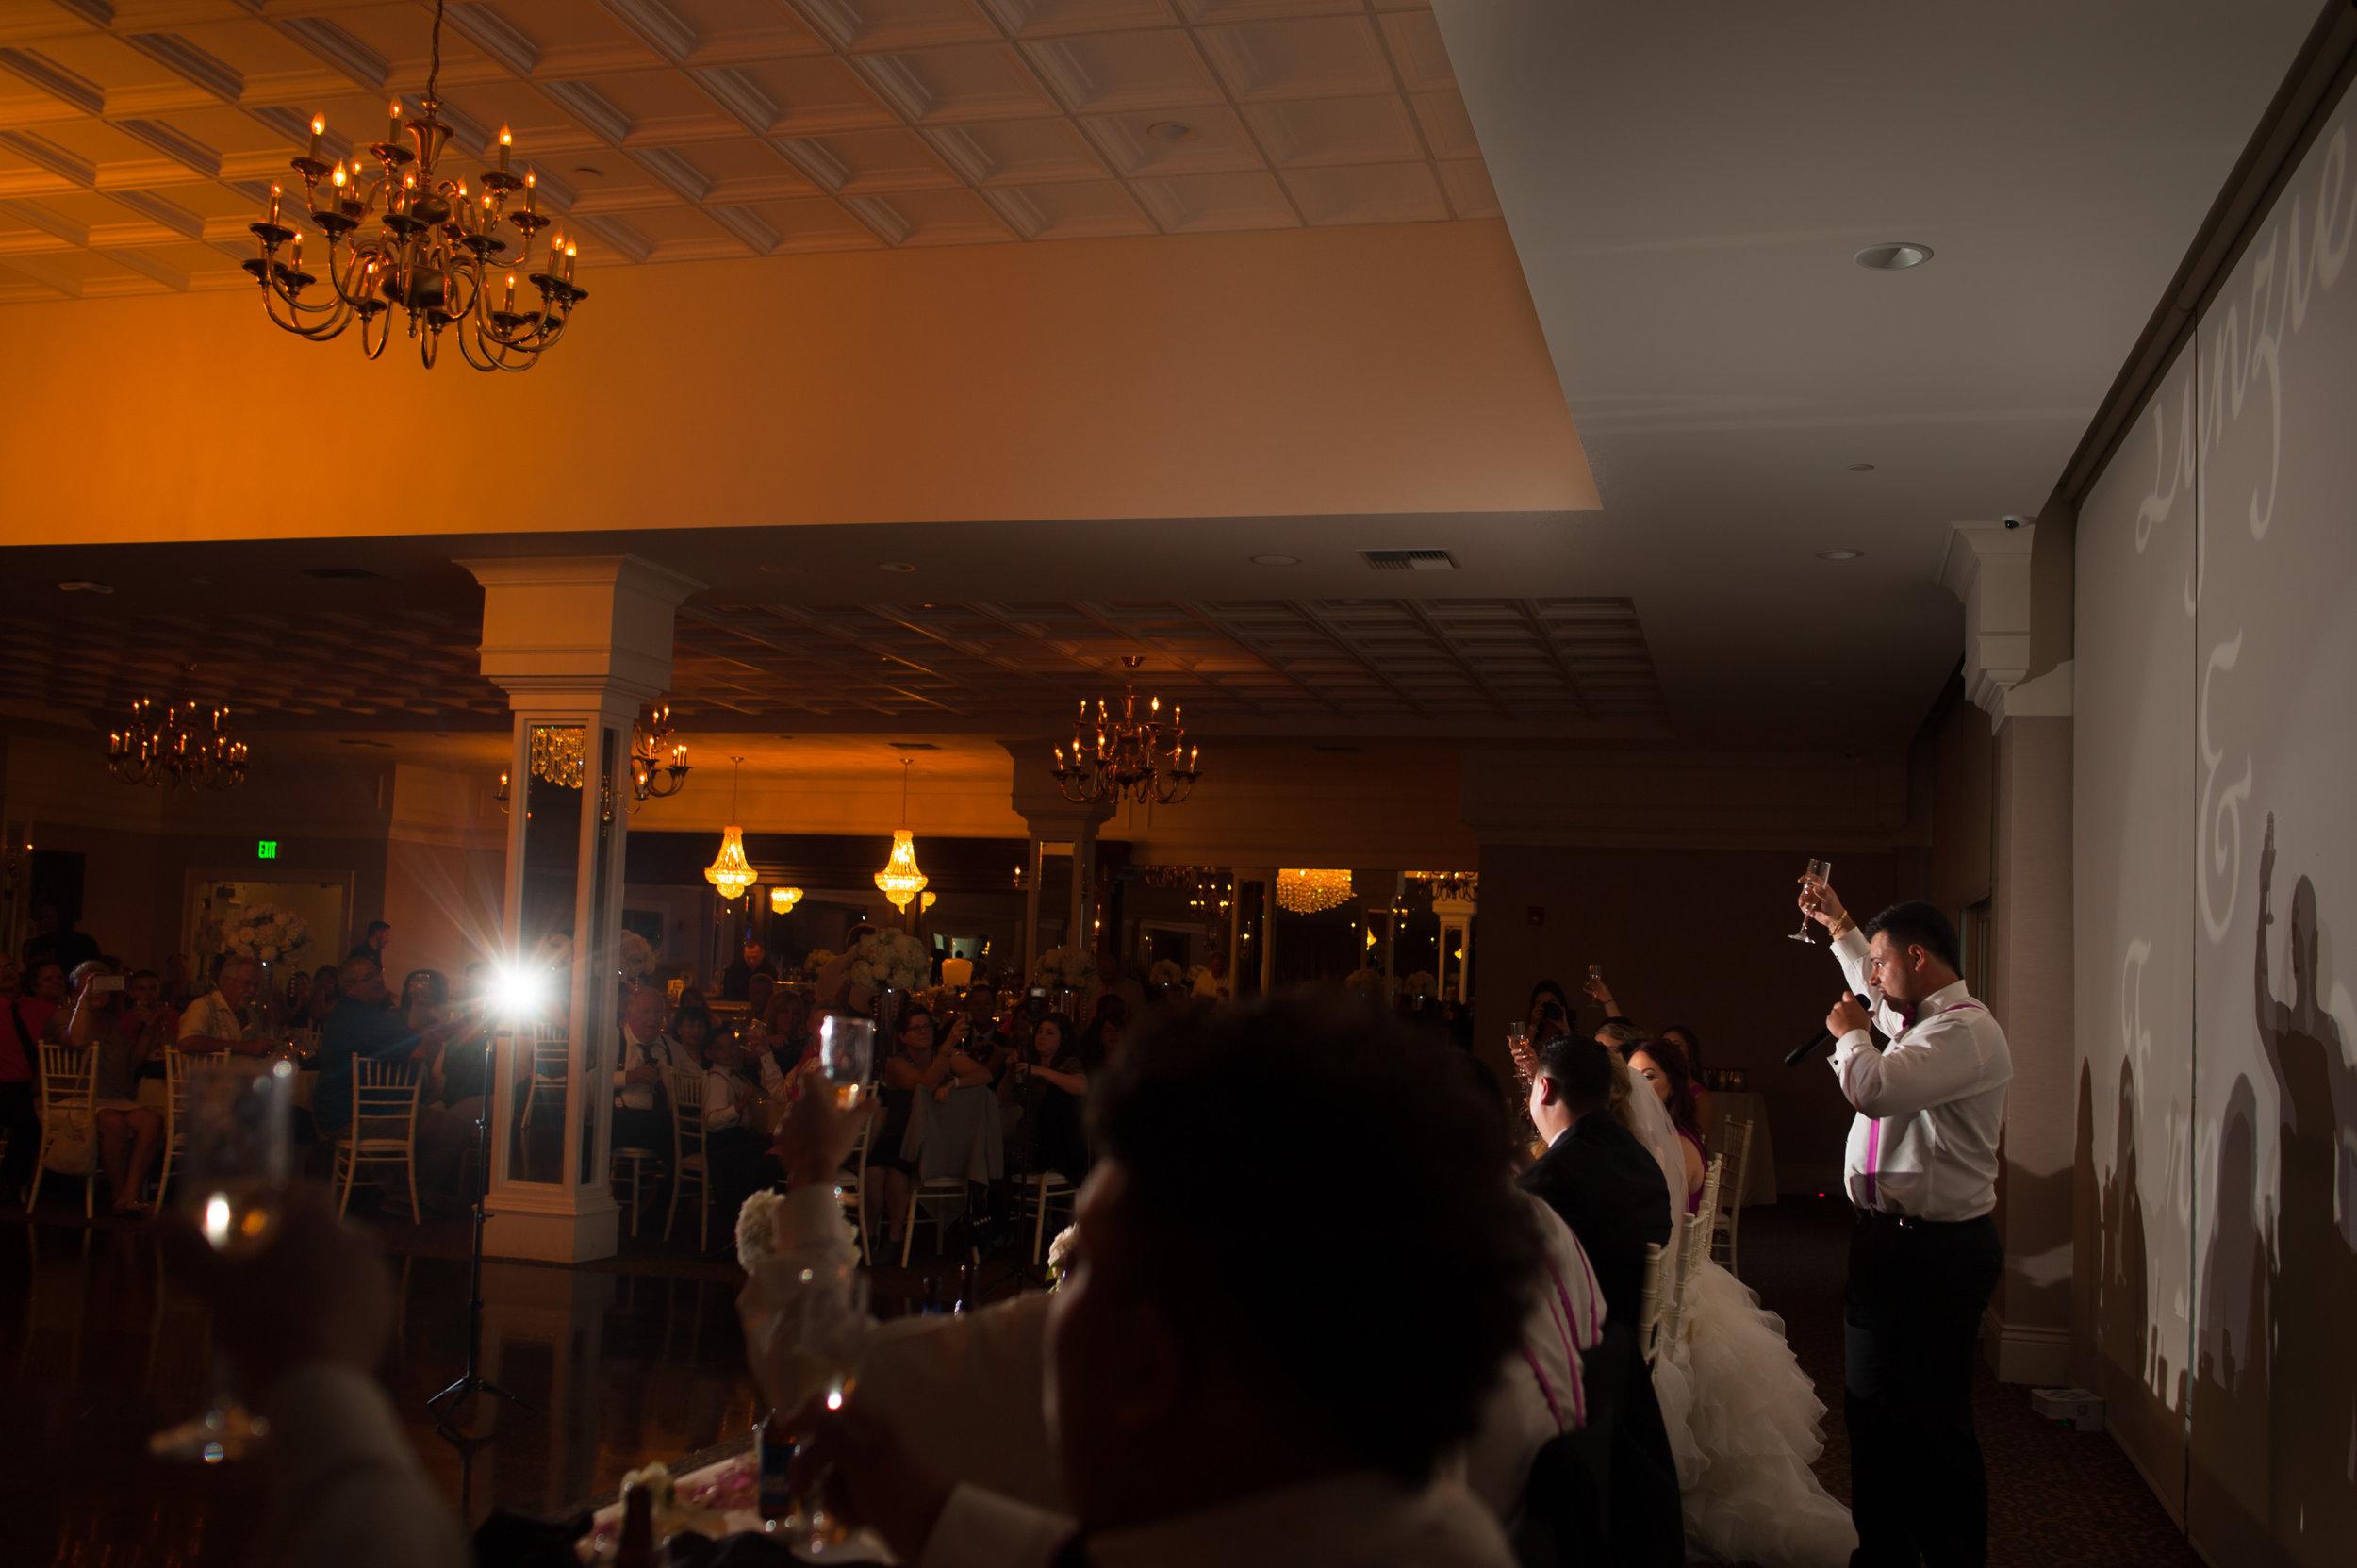 lyndzie-javier-025-arden-hills-sacramento-wedding-photographer-katherine-nicole-photography.JPG